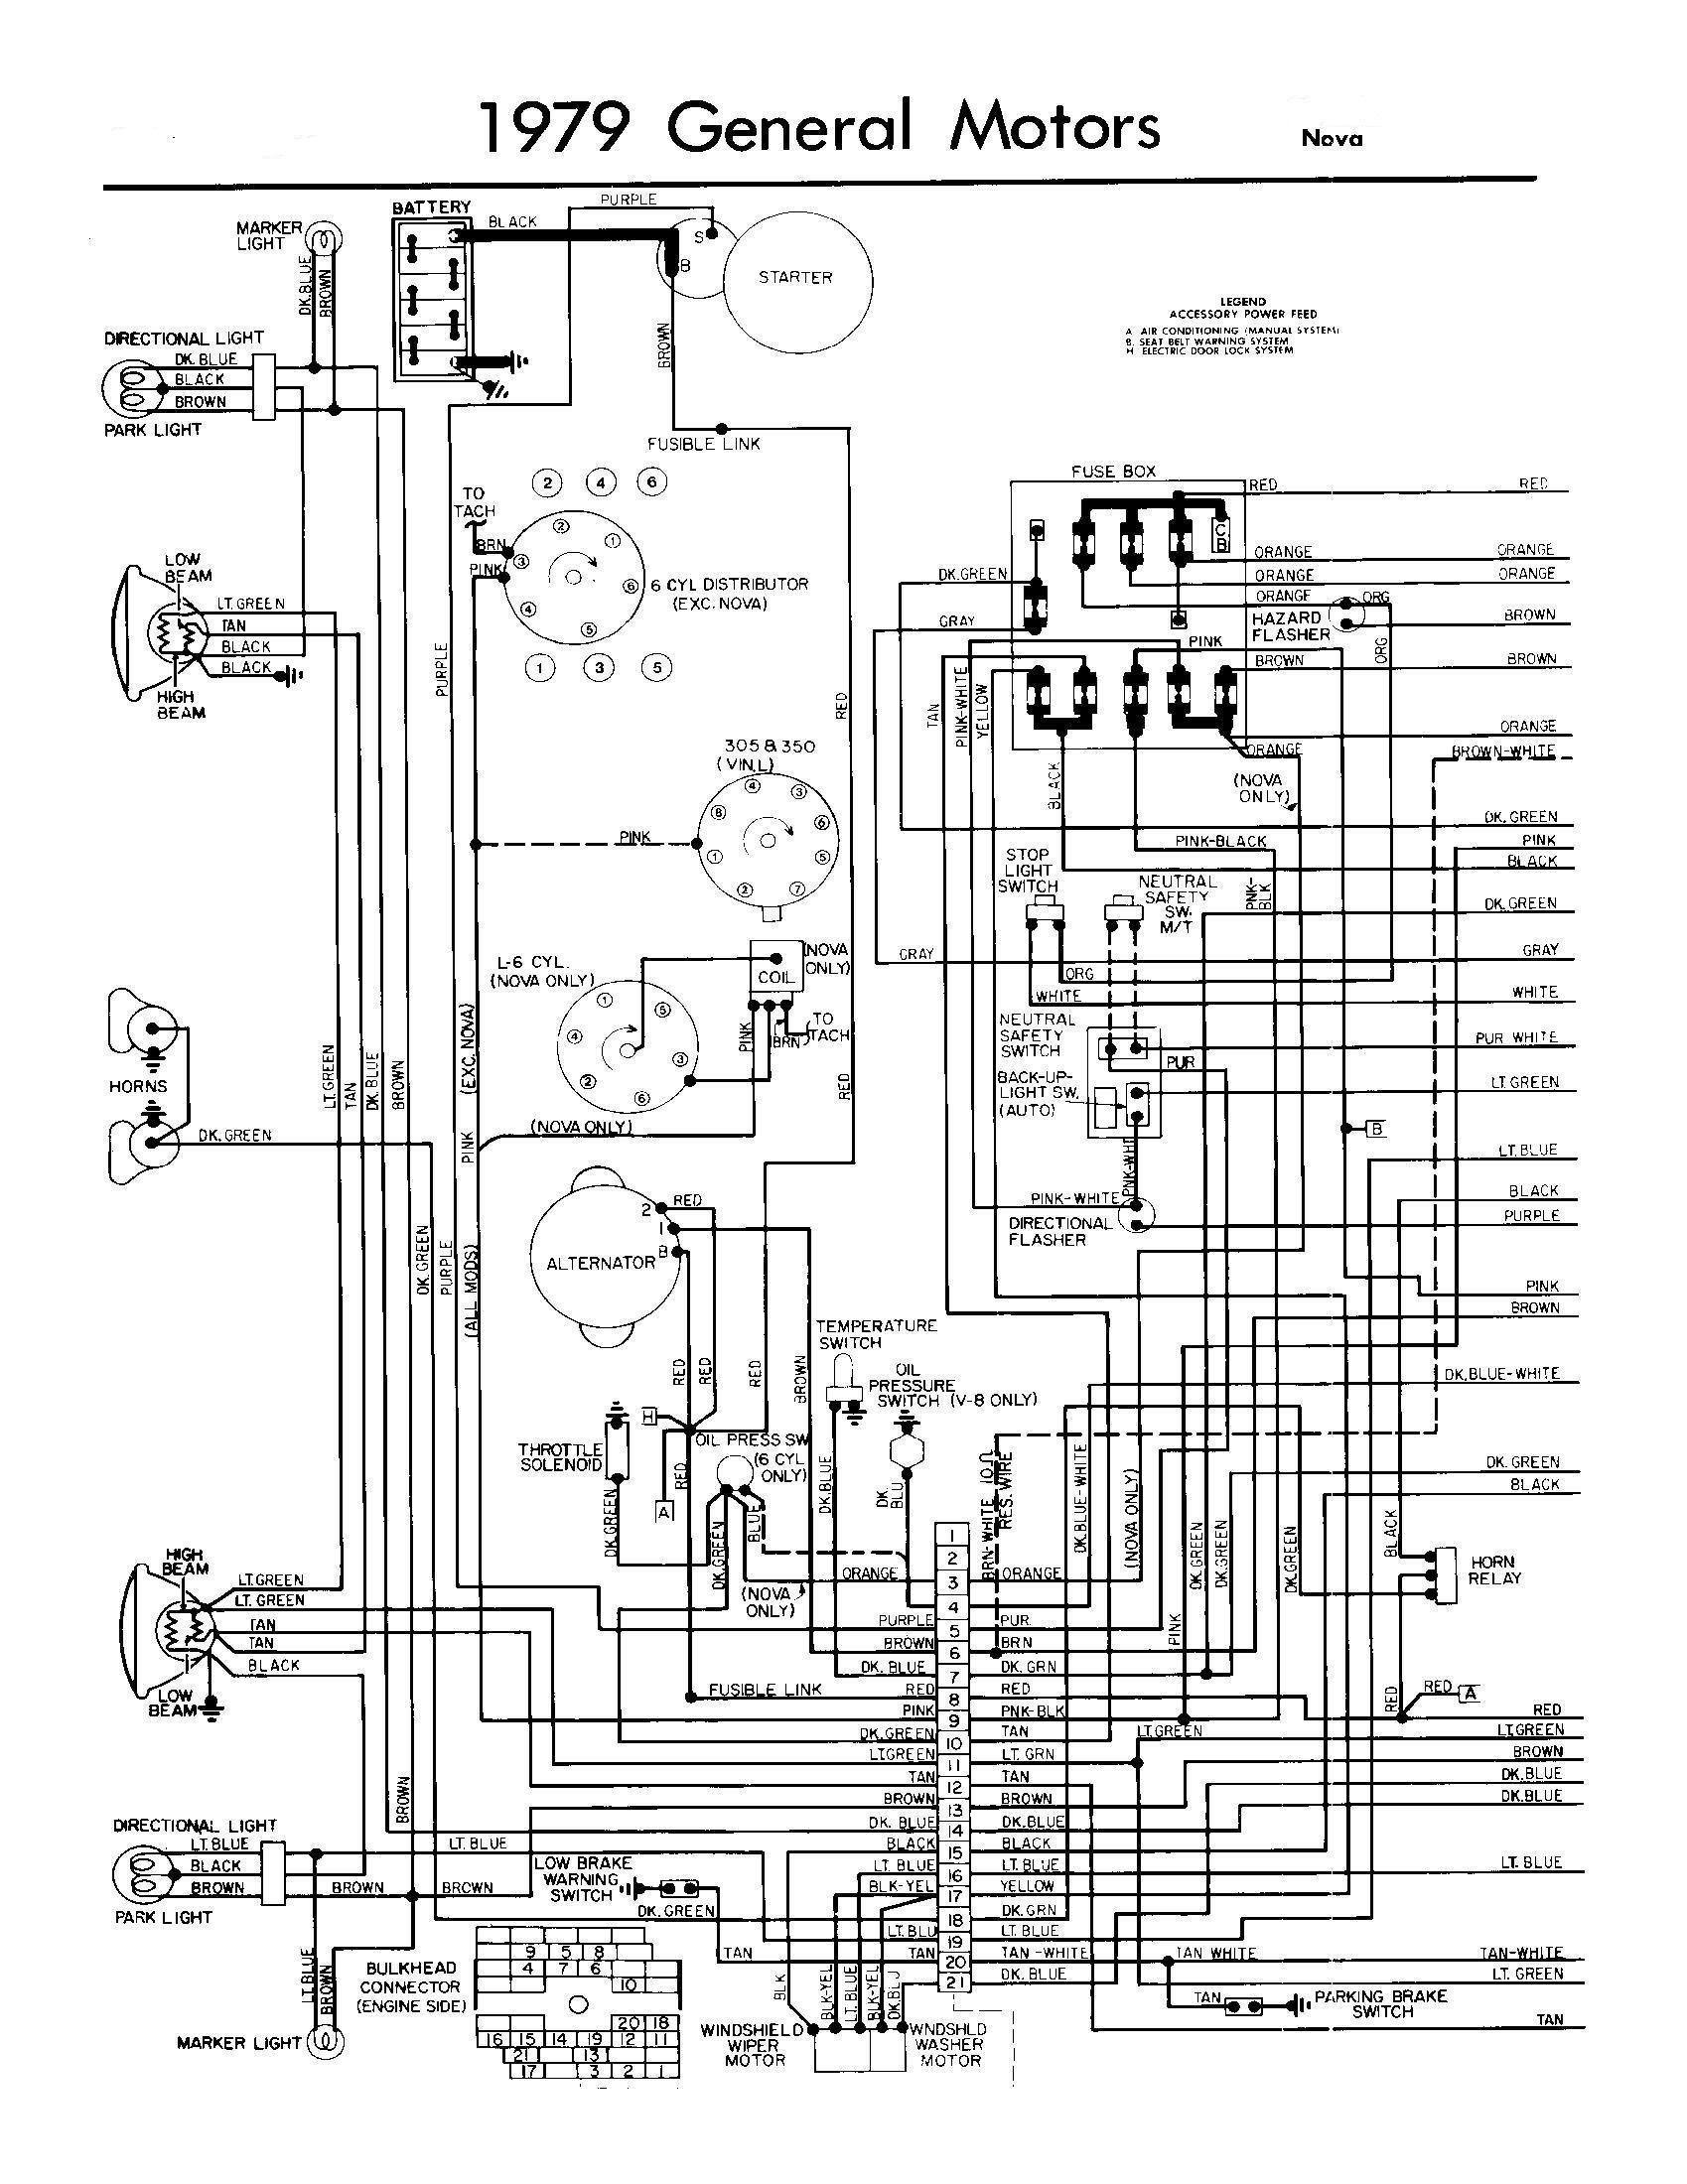 79 Chevy Truck Wiring Diagram Chevy Silverado Wiring Diagram New 1979 Chevy Truck Wiring Diagram Of 79 Chevy Truck Wiring Diagram